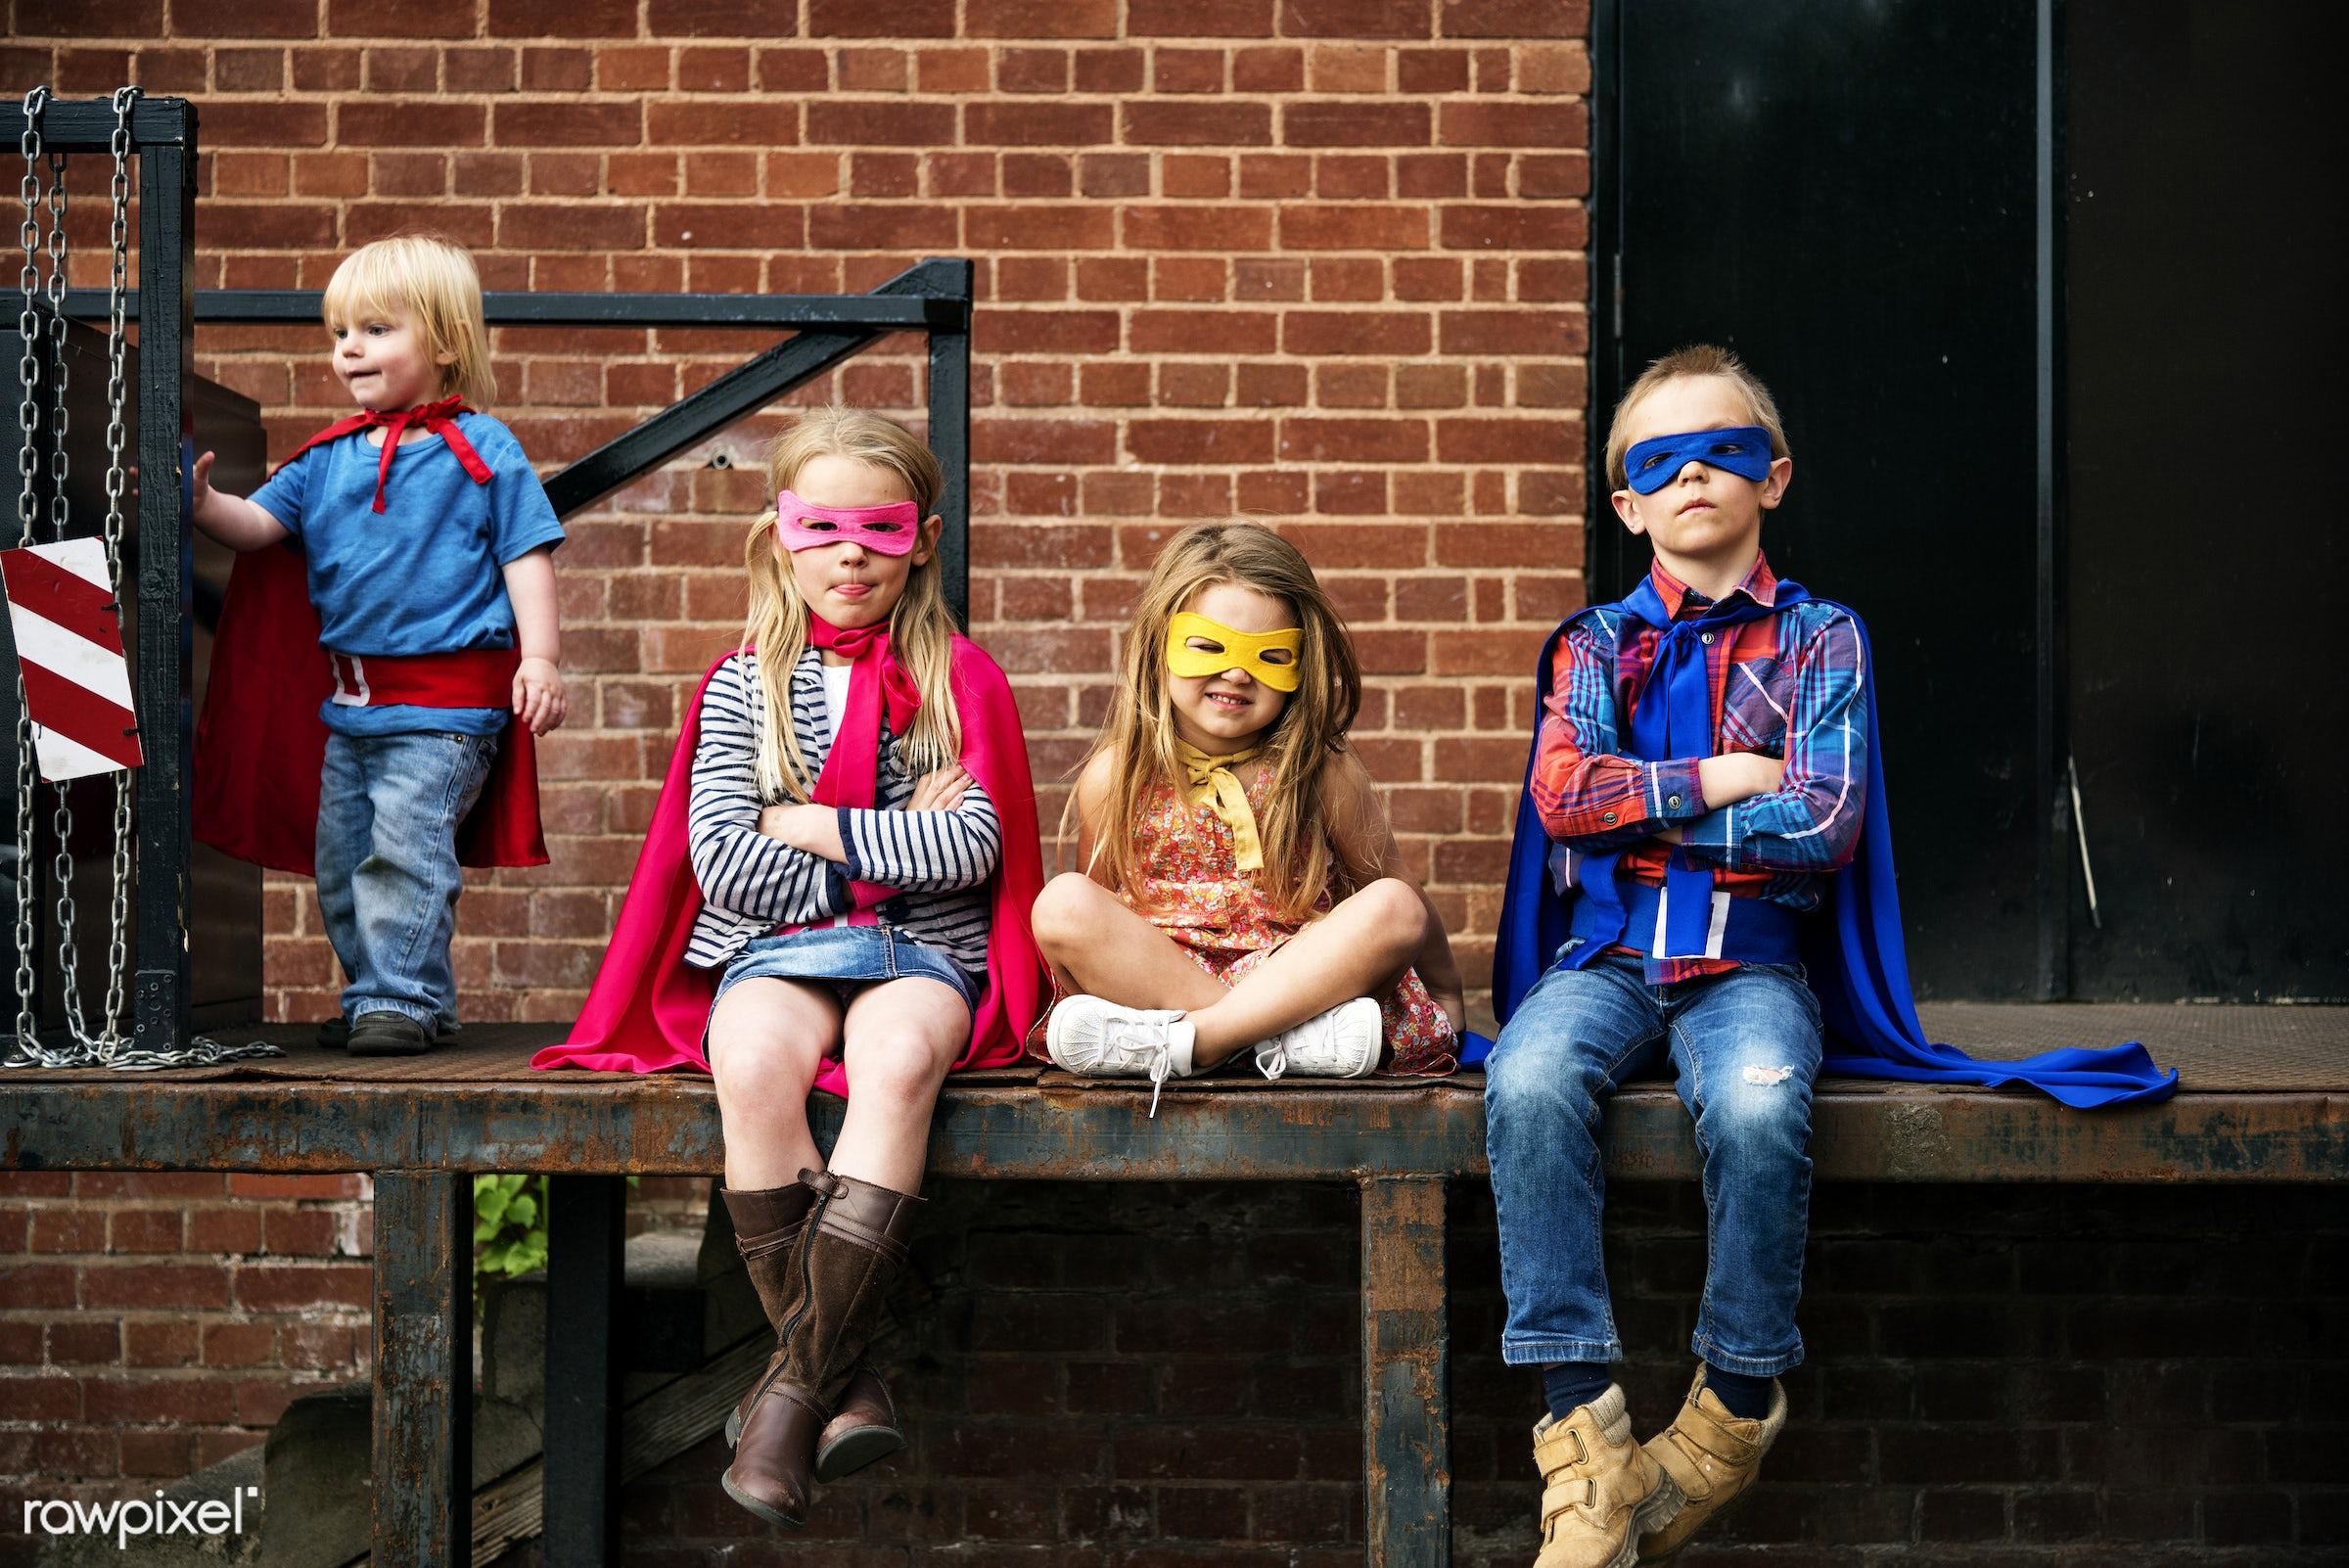 Caucasian children superhero and play shoot  - activity, aspirations, boy, brave, brick wall, brother, building, caucasian,...